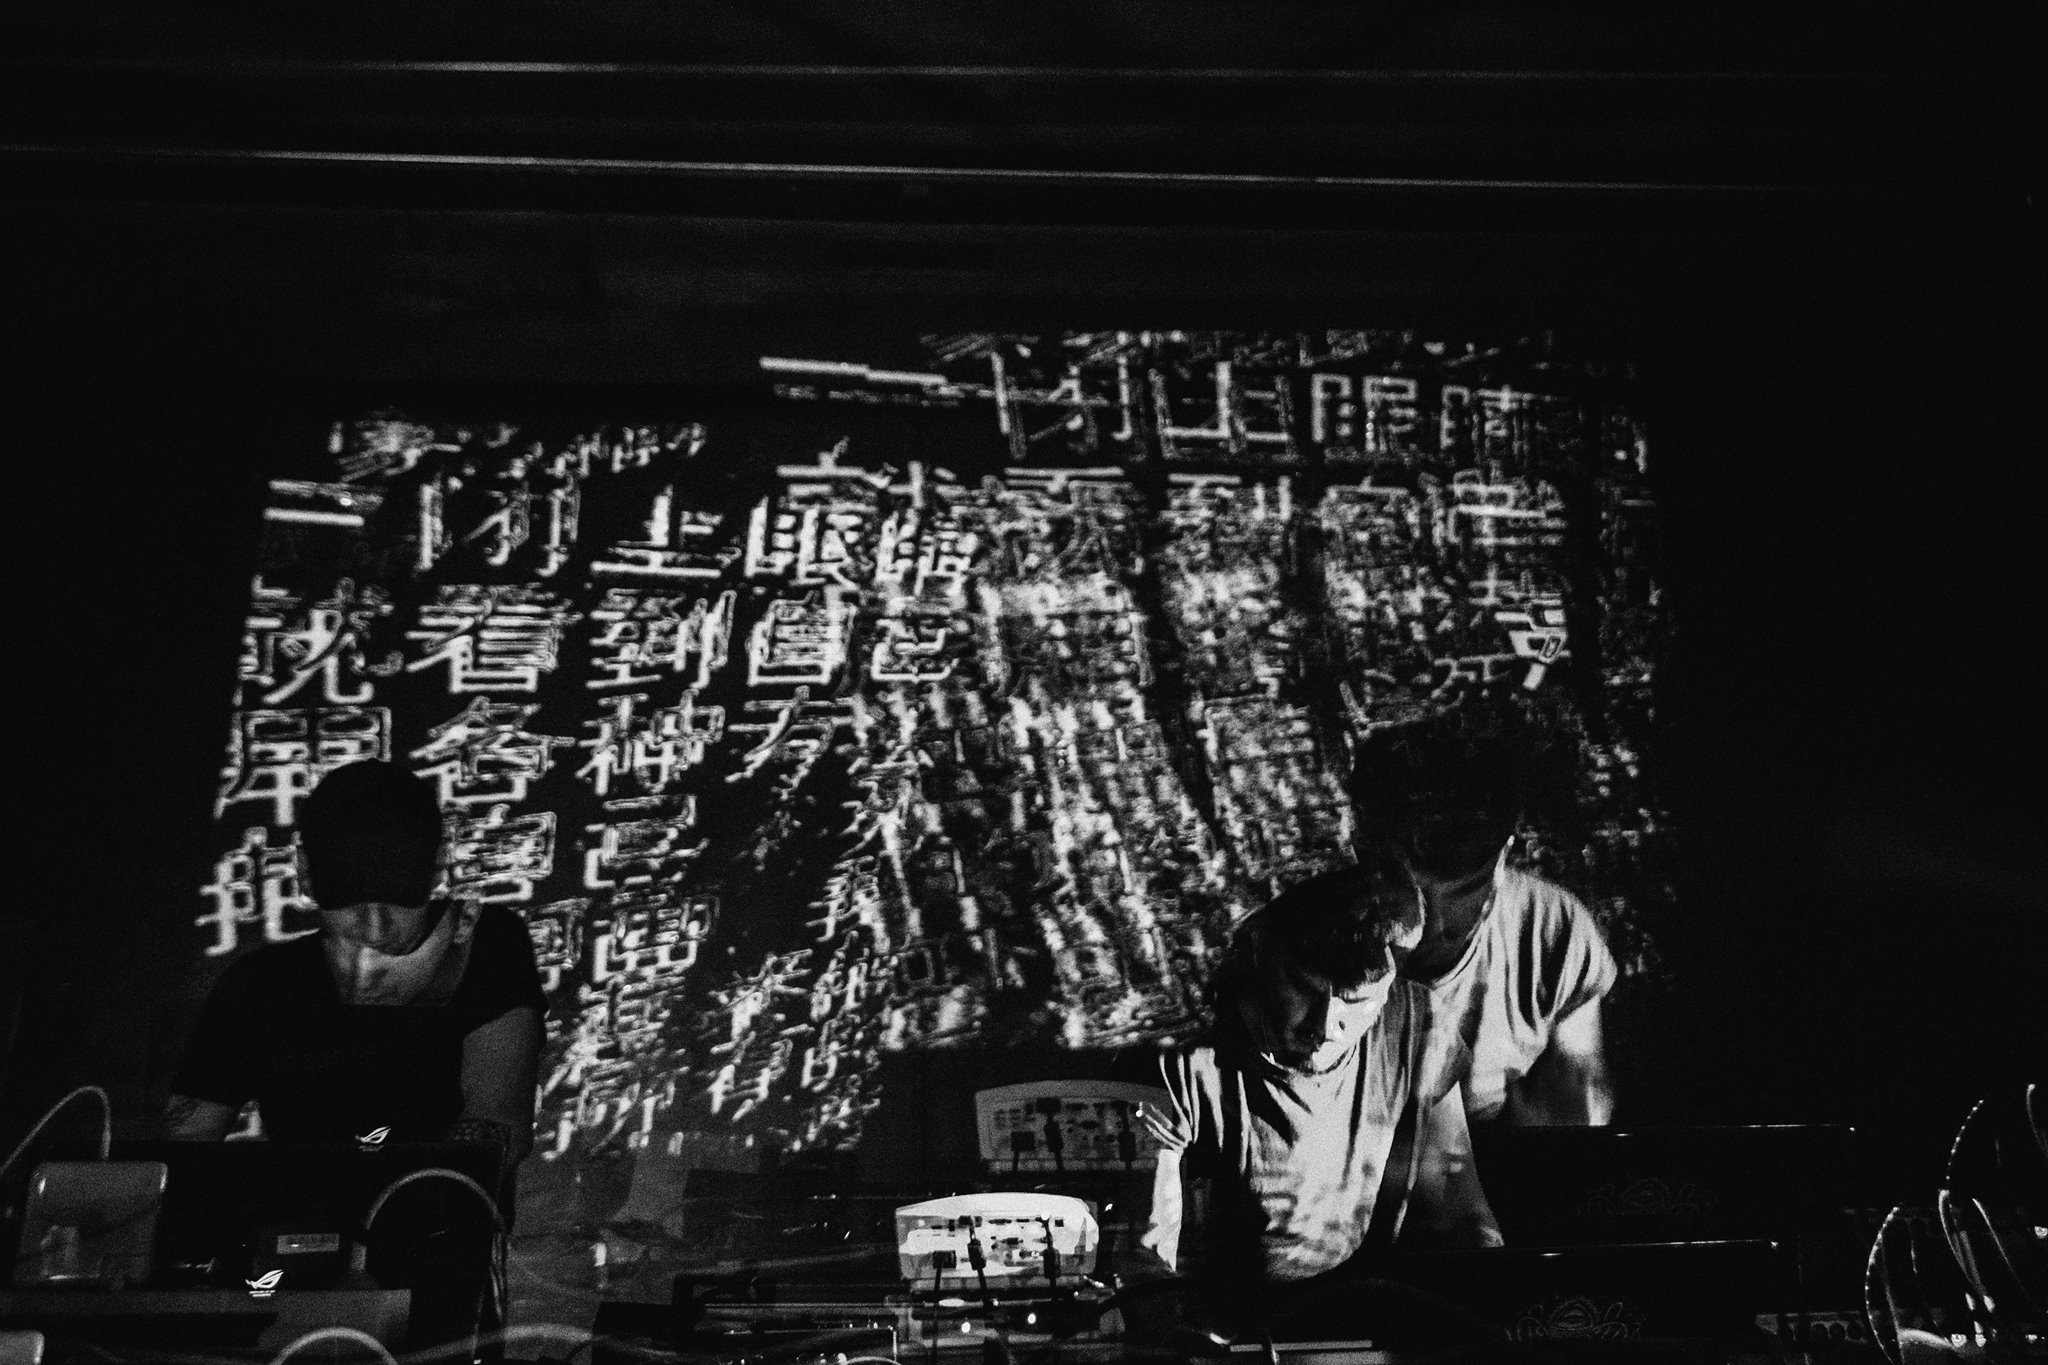 TEOREMA - BARCELONA - Performance with SQUARIC live